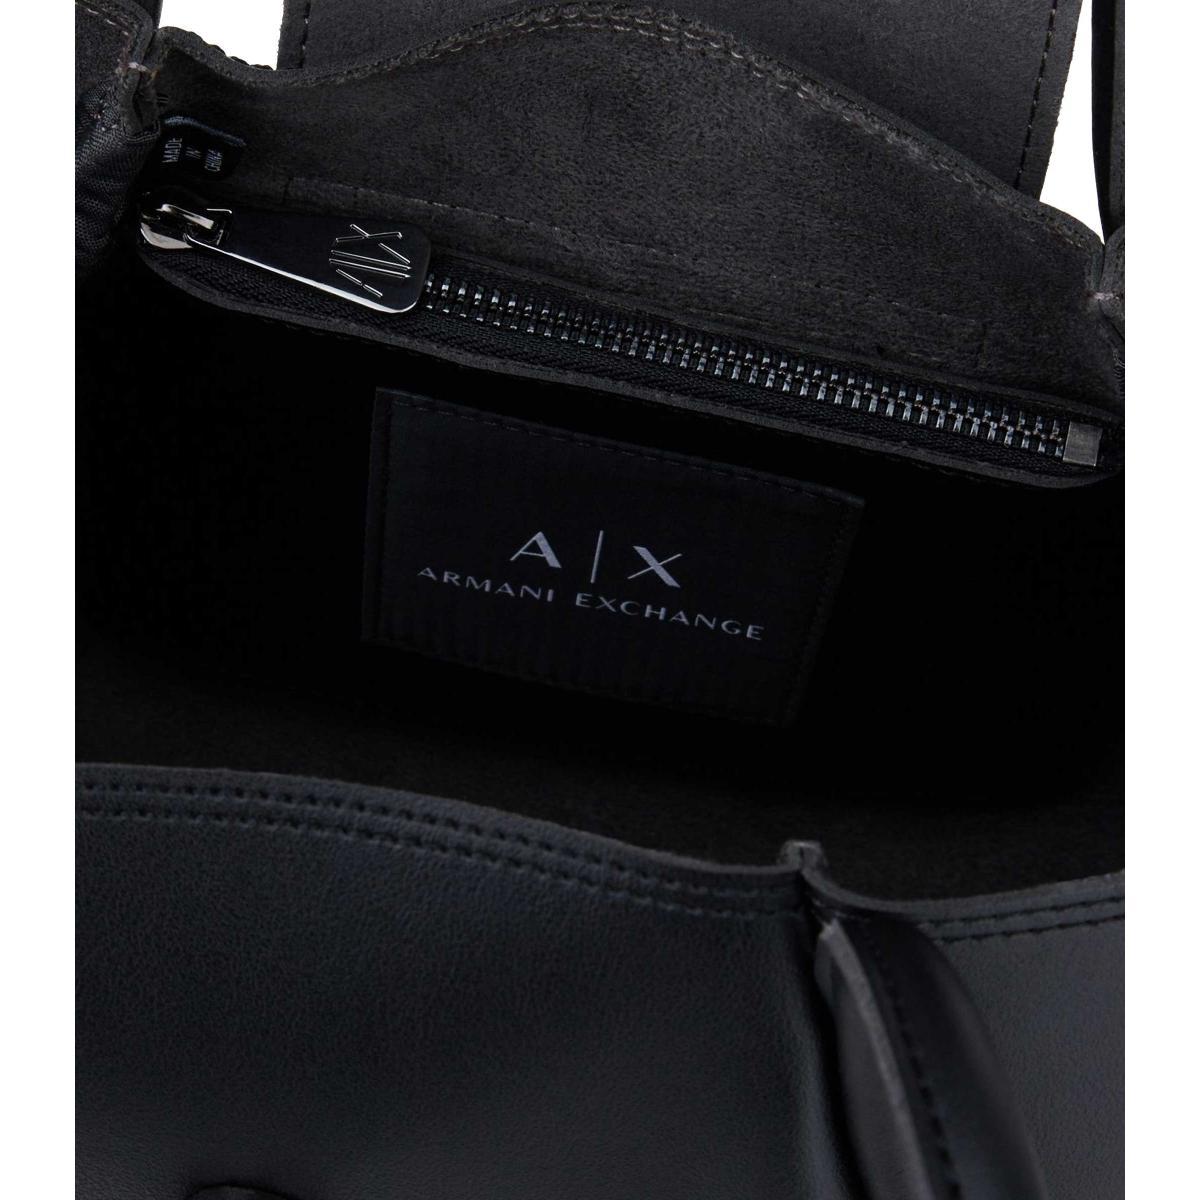 Shopping Bag piccola Armani Exchange da donna rif. 942558 9P862